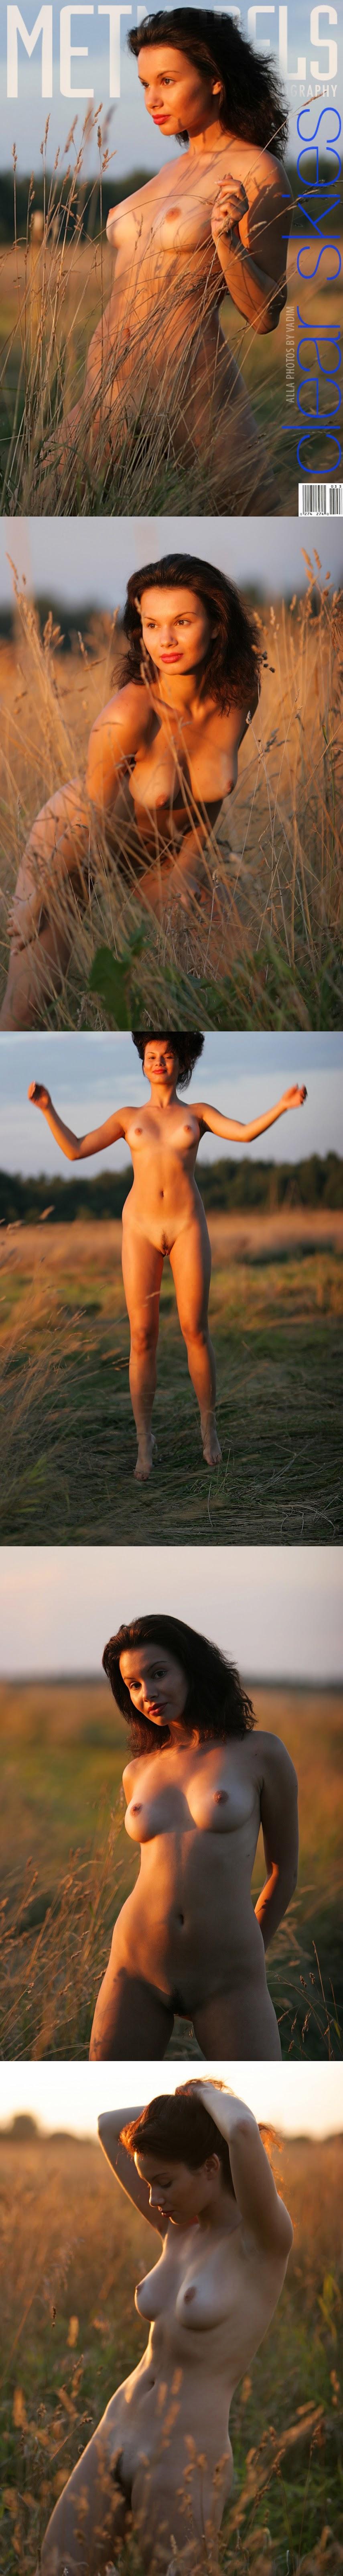 09 - ALLA CLEAR SKIES by Vadim Rigin sexy girls image jav